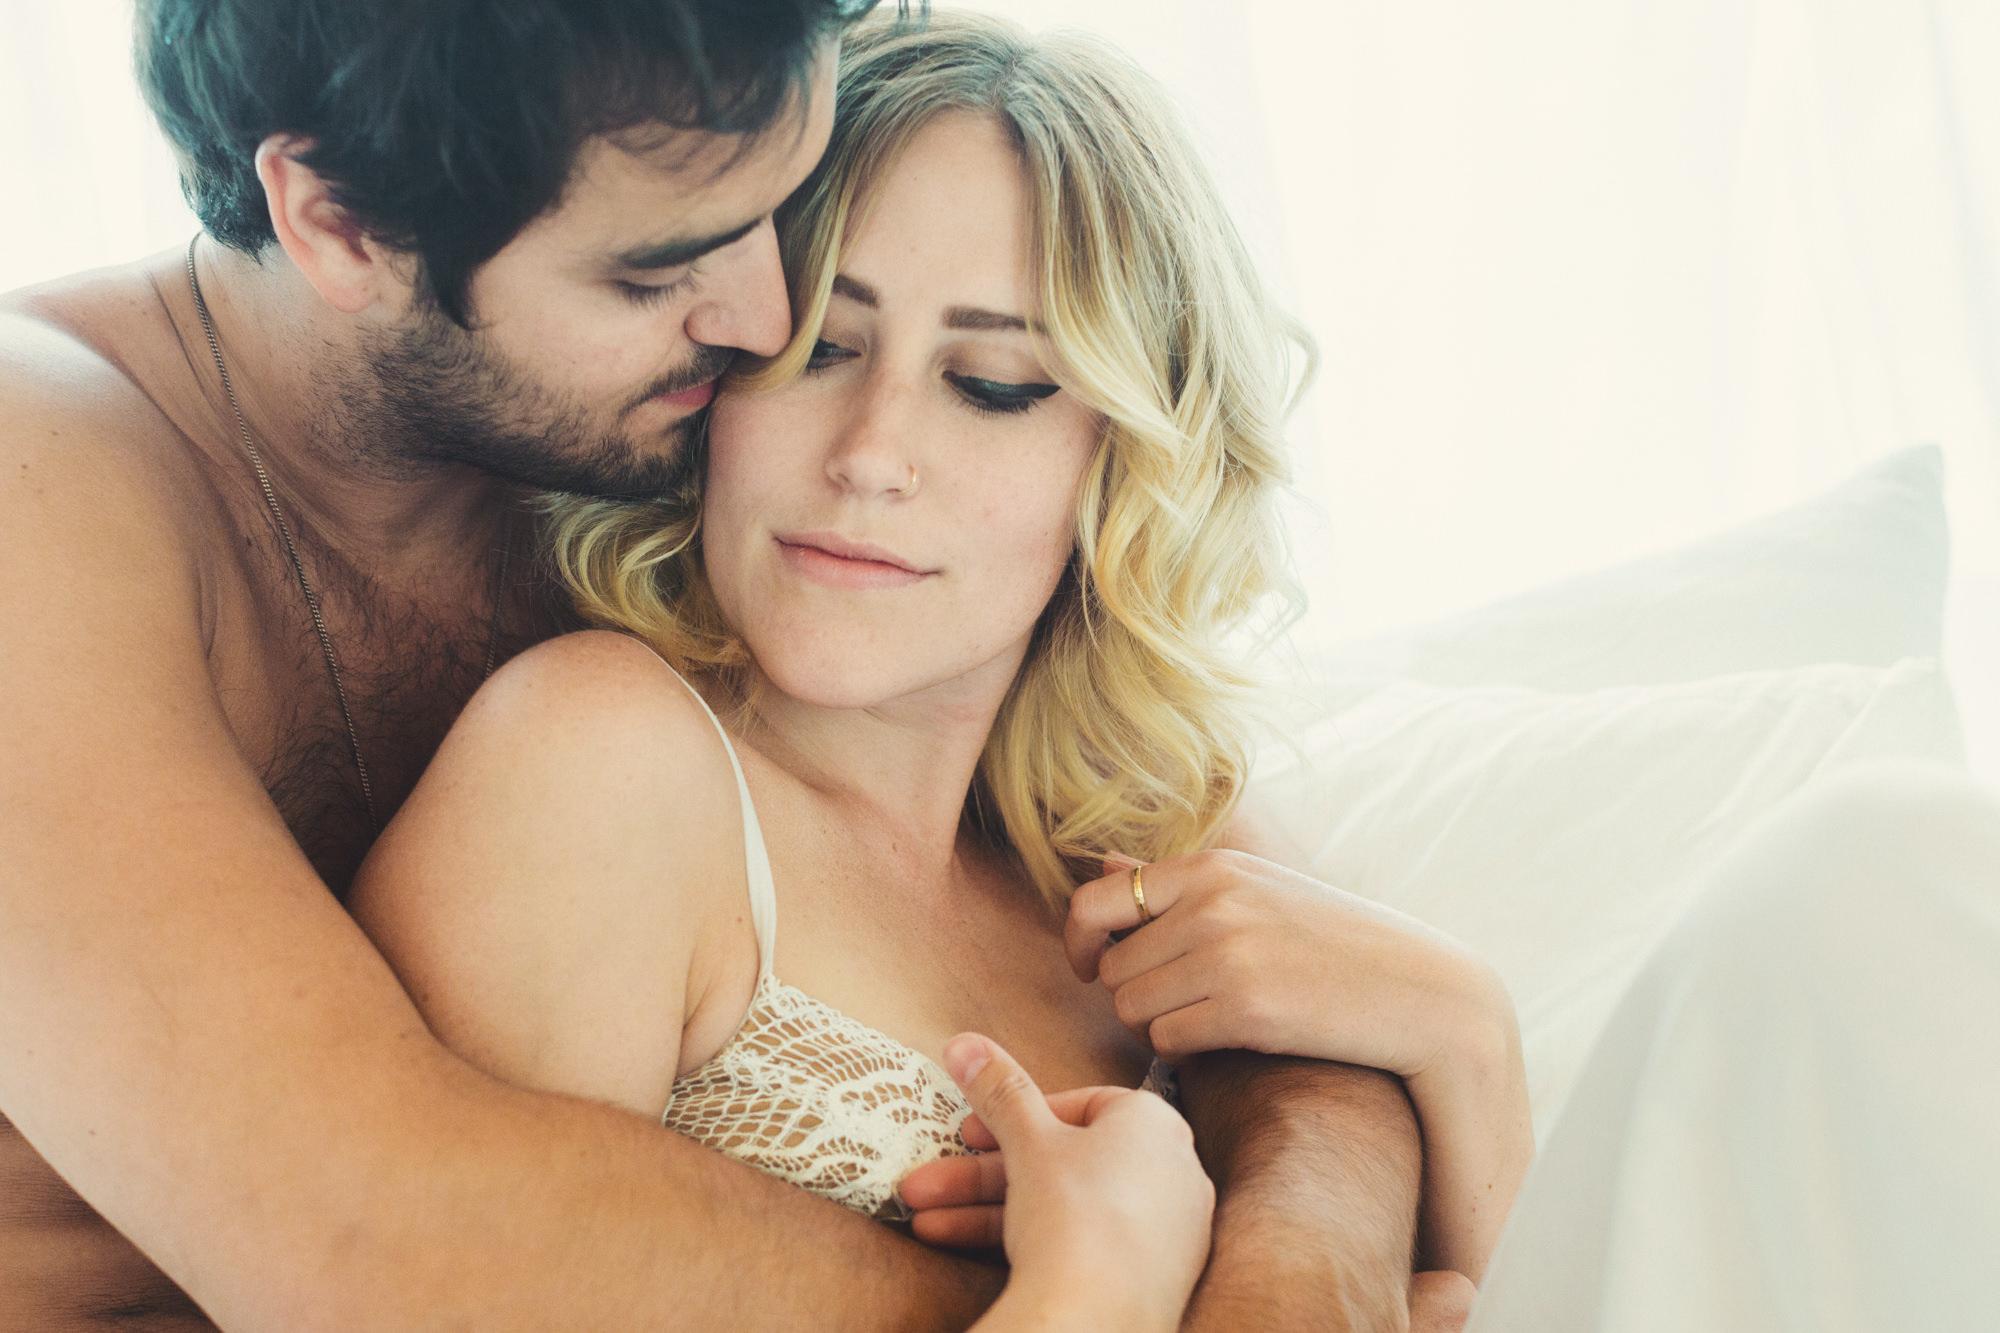 Intimate Couple Session@Anne-Claire Brun 27